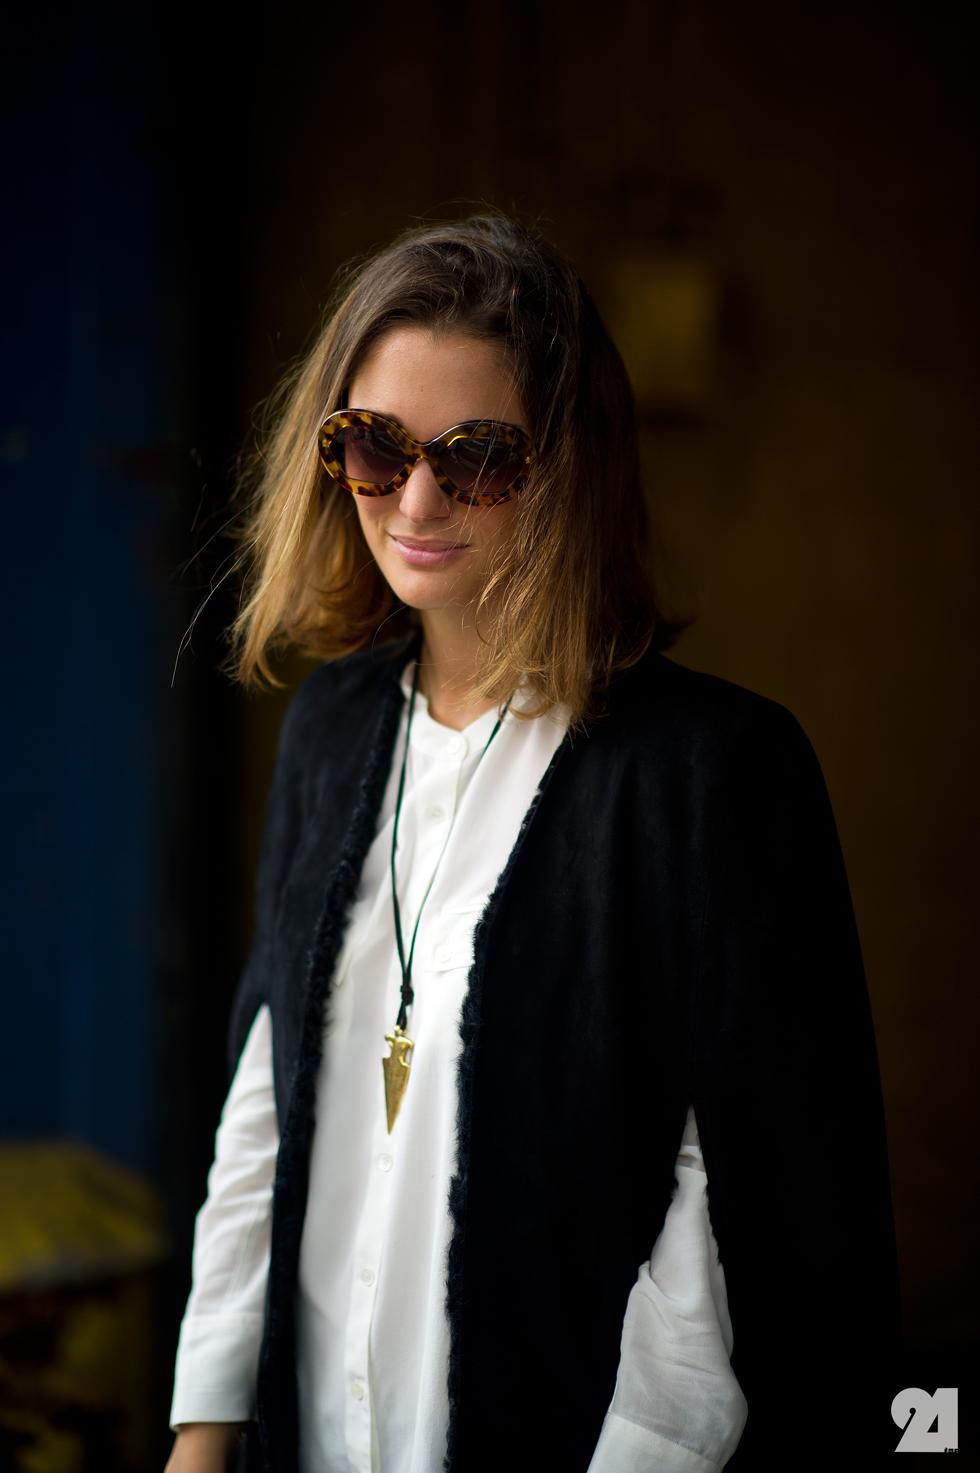 1074-Le-21eme-Arrondissement-Adam-Katz-Sinding-Sofia-Sanchez-Barrenechea-Mercedes-Benz-New-York-Fashion-Week-Spring-Summer-2012-New-York-City-Street-Style-Fashion-Blog_21E0743.jpg